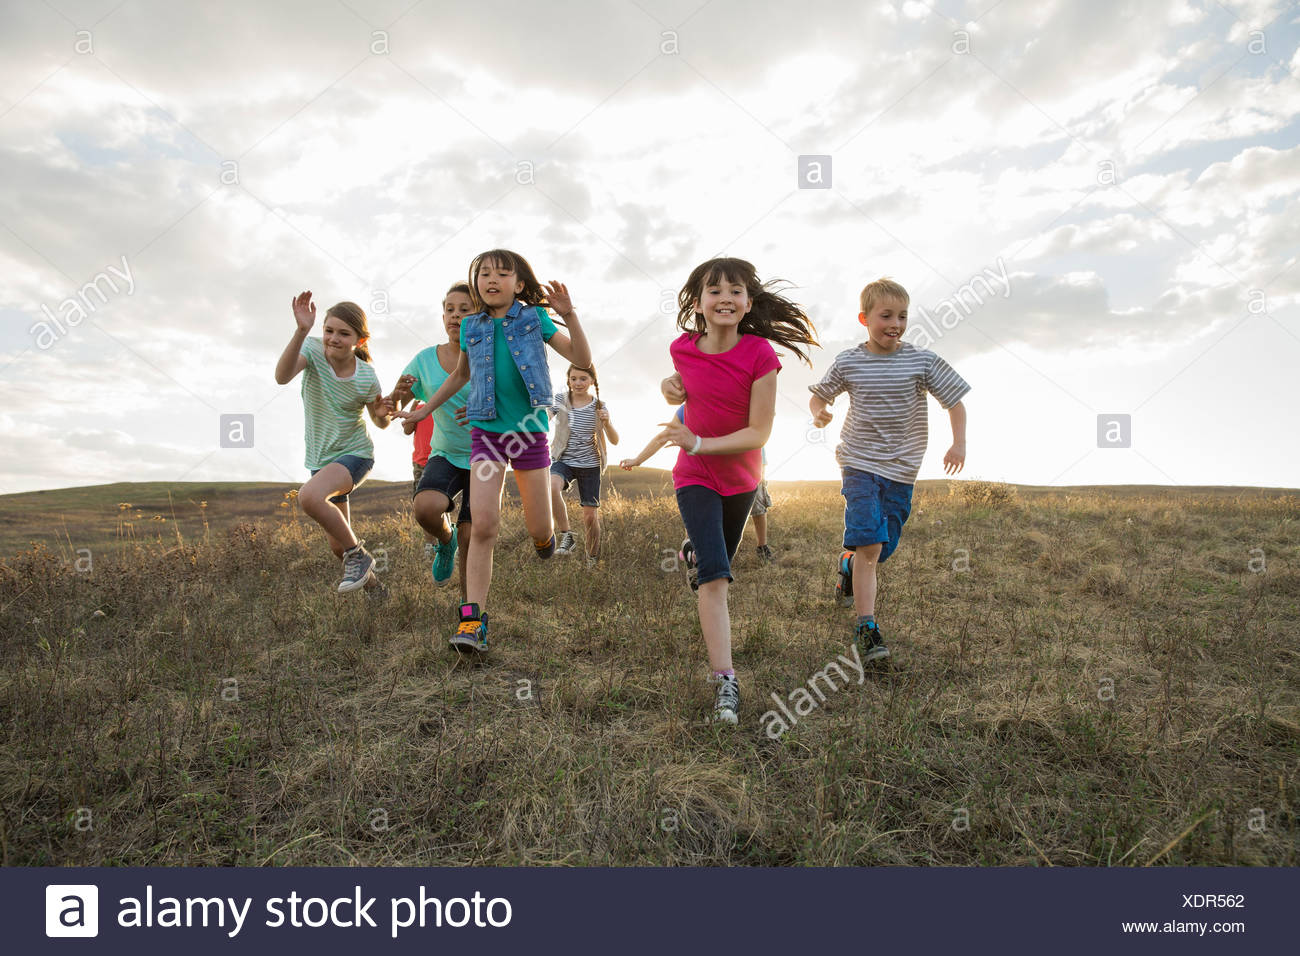 Begeistert Kinder laufen auf Hügel Stockbild